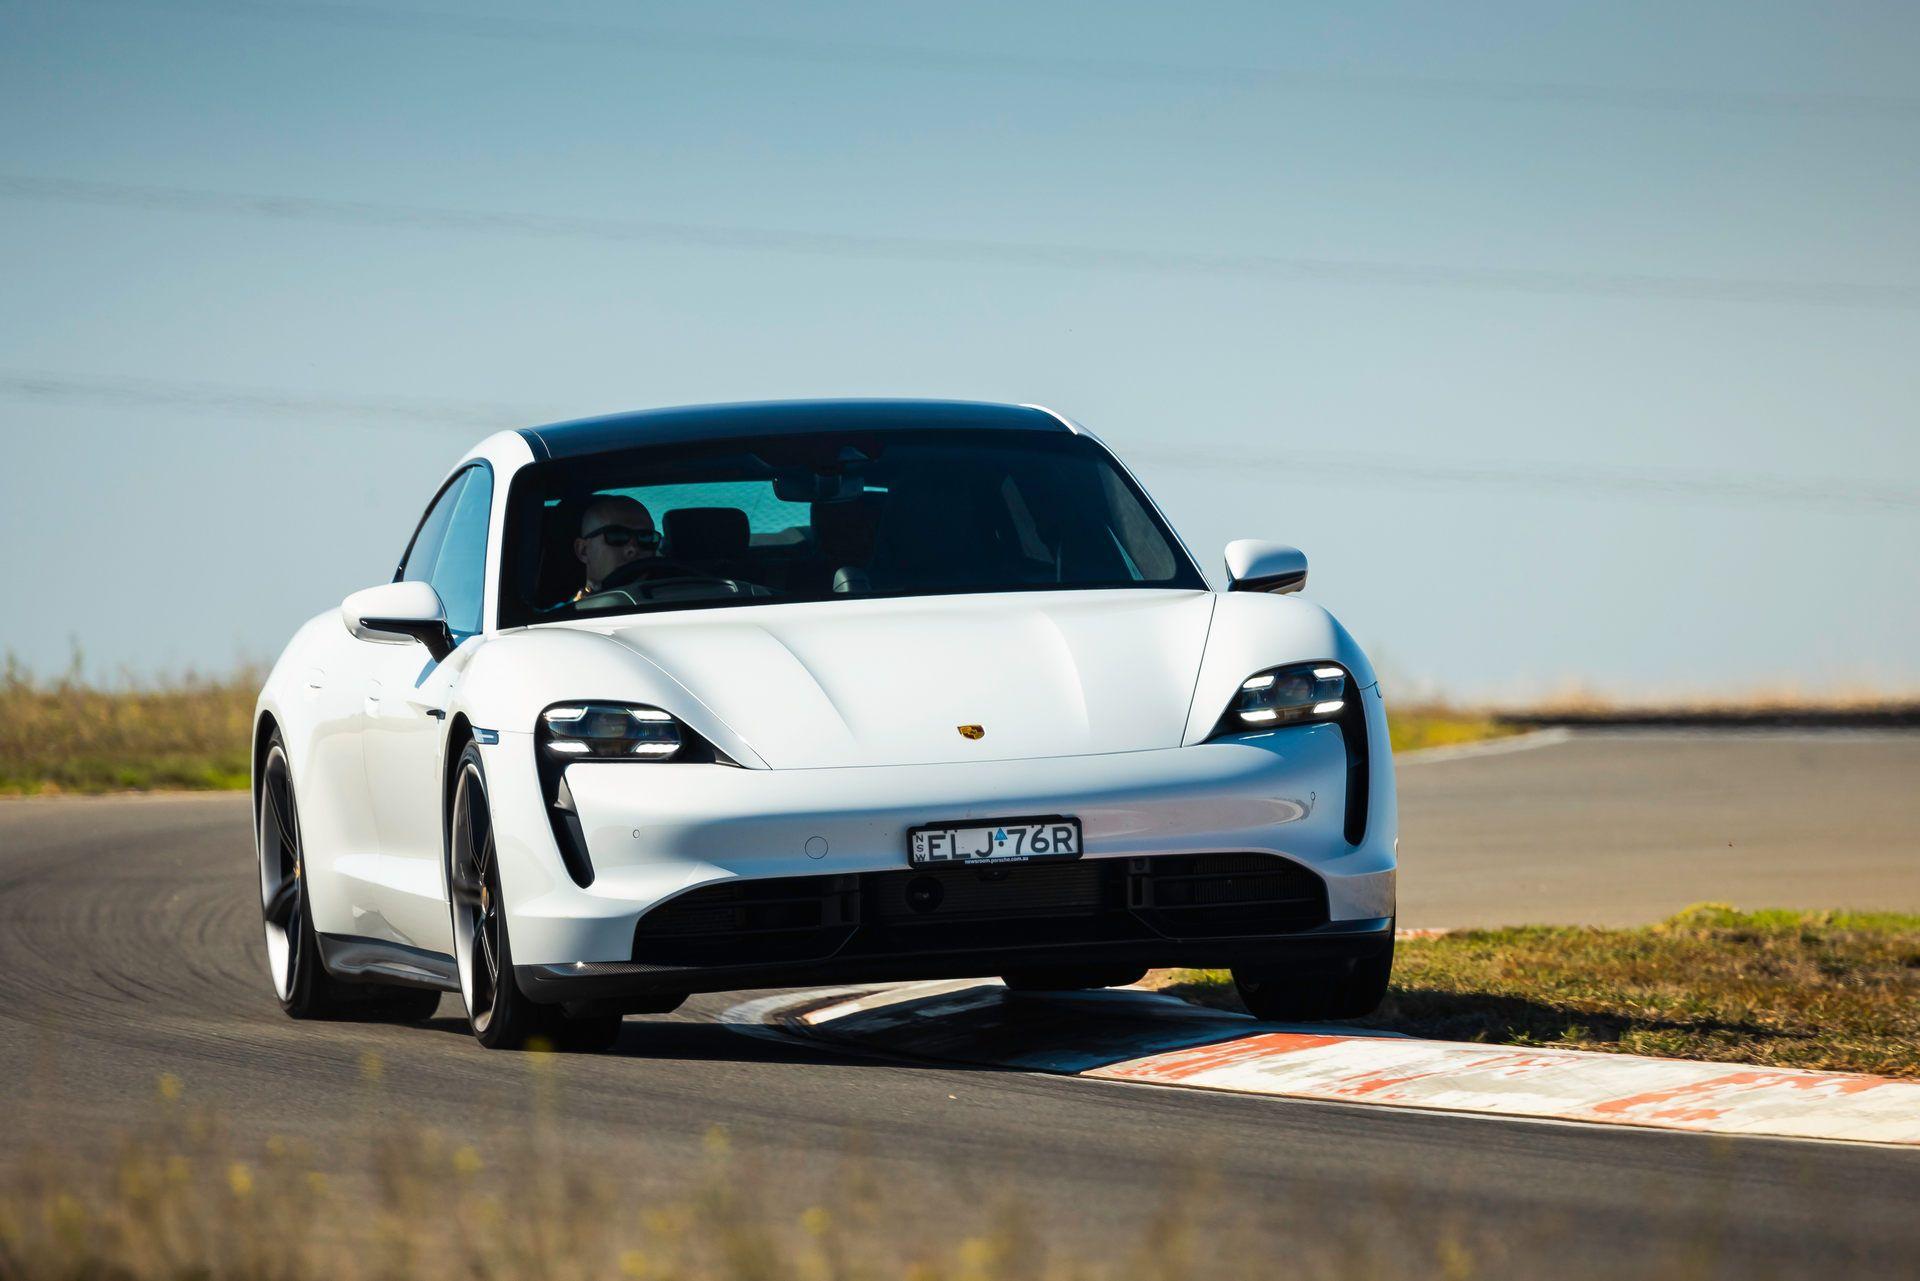 Porsche-Taycan-Turbo-S-The-Bend-Motorsport-Park-30